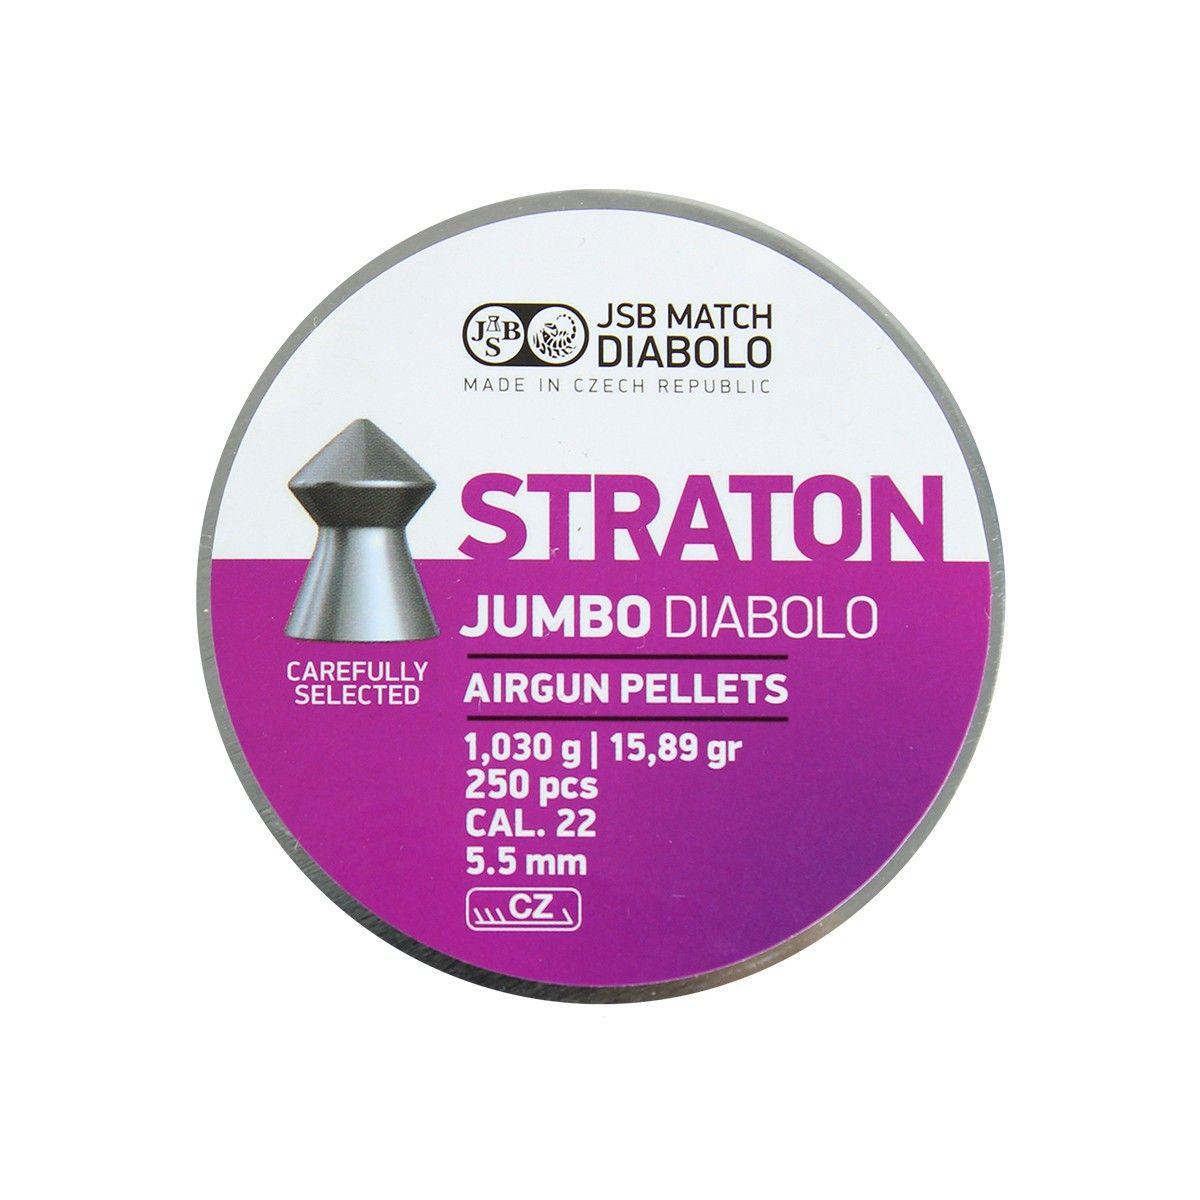 Chumbinho JSB Straton Jumbo Diabolo 5.5mm 250un. 15.89gr